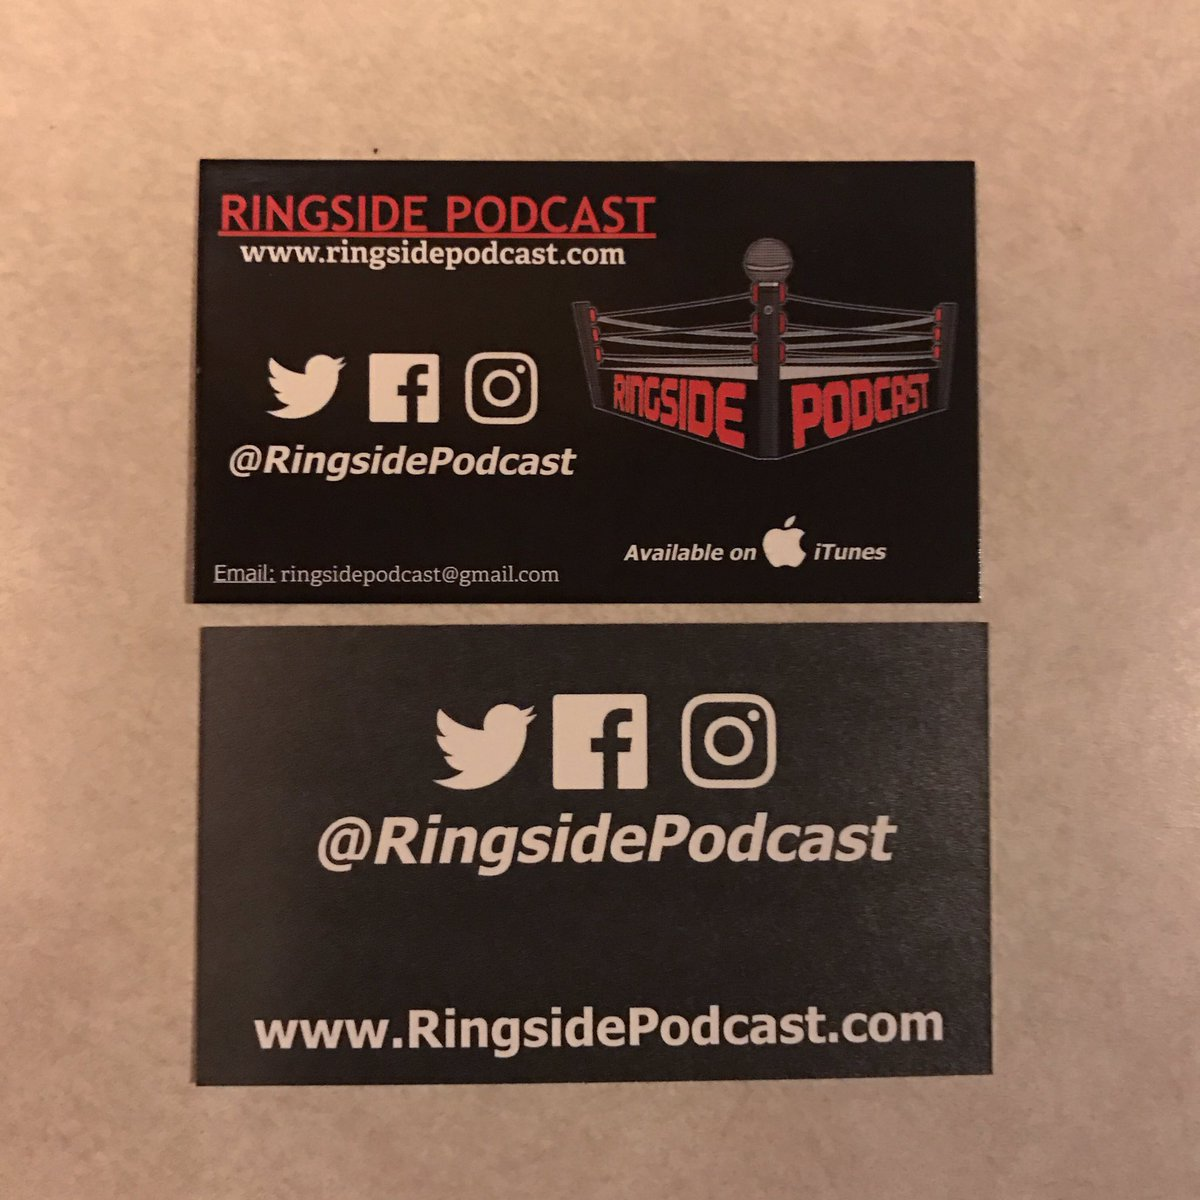 #RingsidePodcast #ProWrestling #Ringside #WWE #SDLive #RAW #ImpactWrestling #ROH #EVOLVE #NXT #WWENXT #OVW #PWMania #PipeBomb #ThisIsAwesomepic.twitter.com/sgfskj3pWj